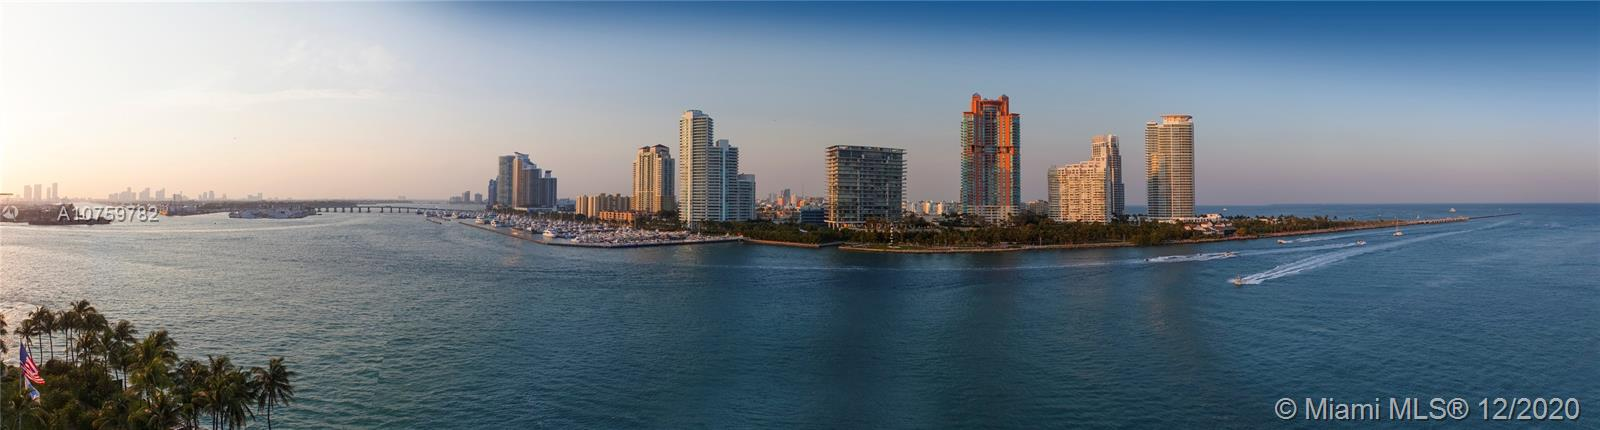 6853 Fisher Island Dr 6853, Miami Beach, FL 33109